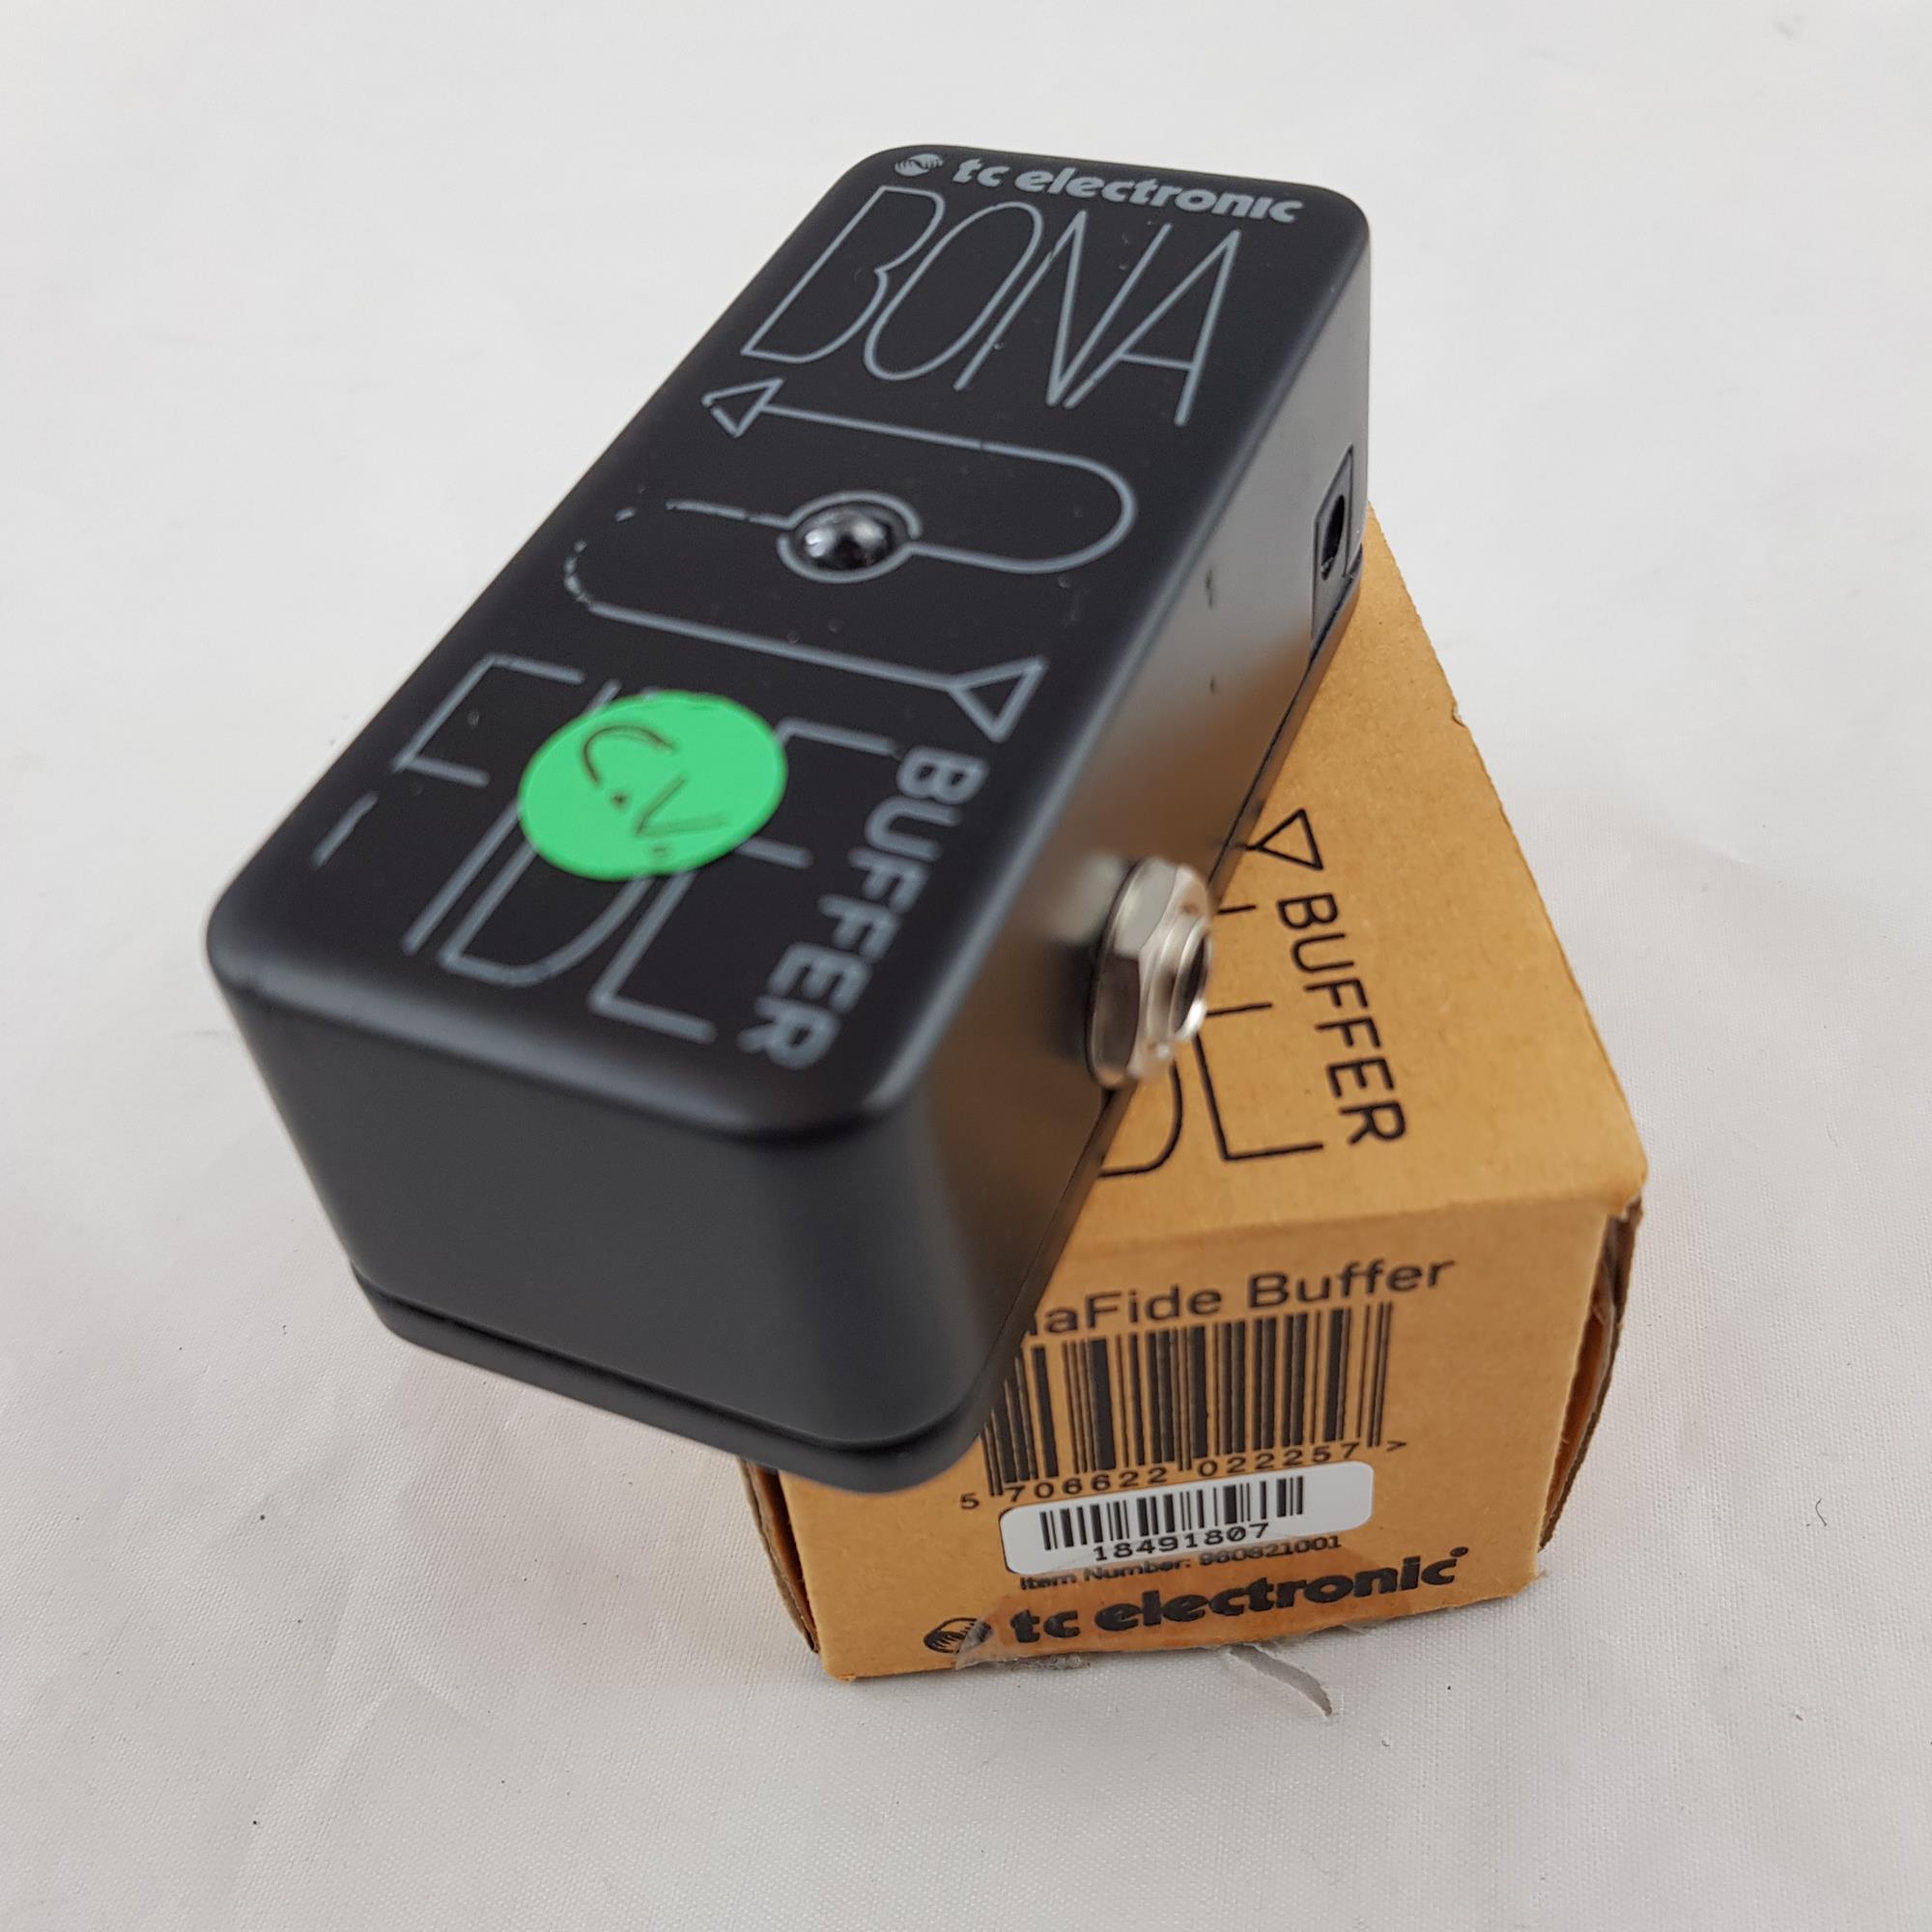 TC-ELECTRONIC-BONAFIDE-BUFFER-sku-1598718059598